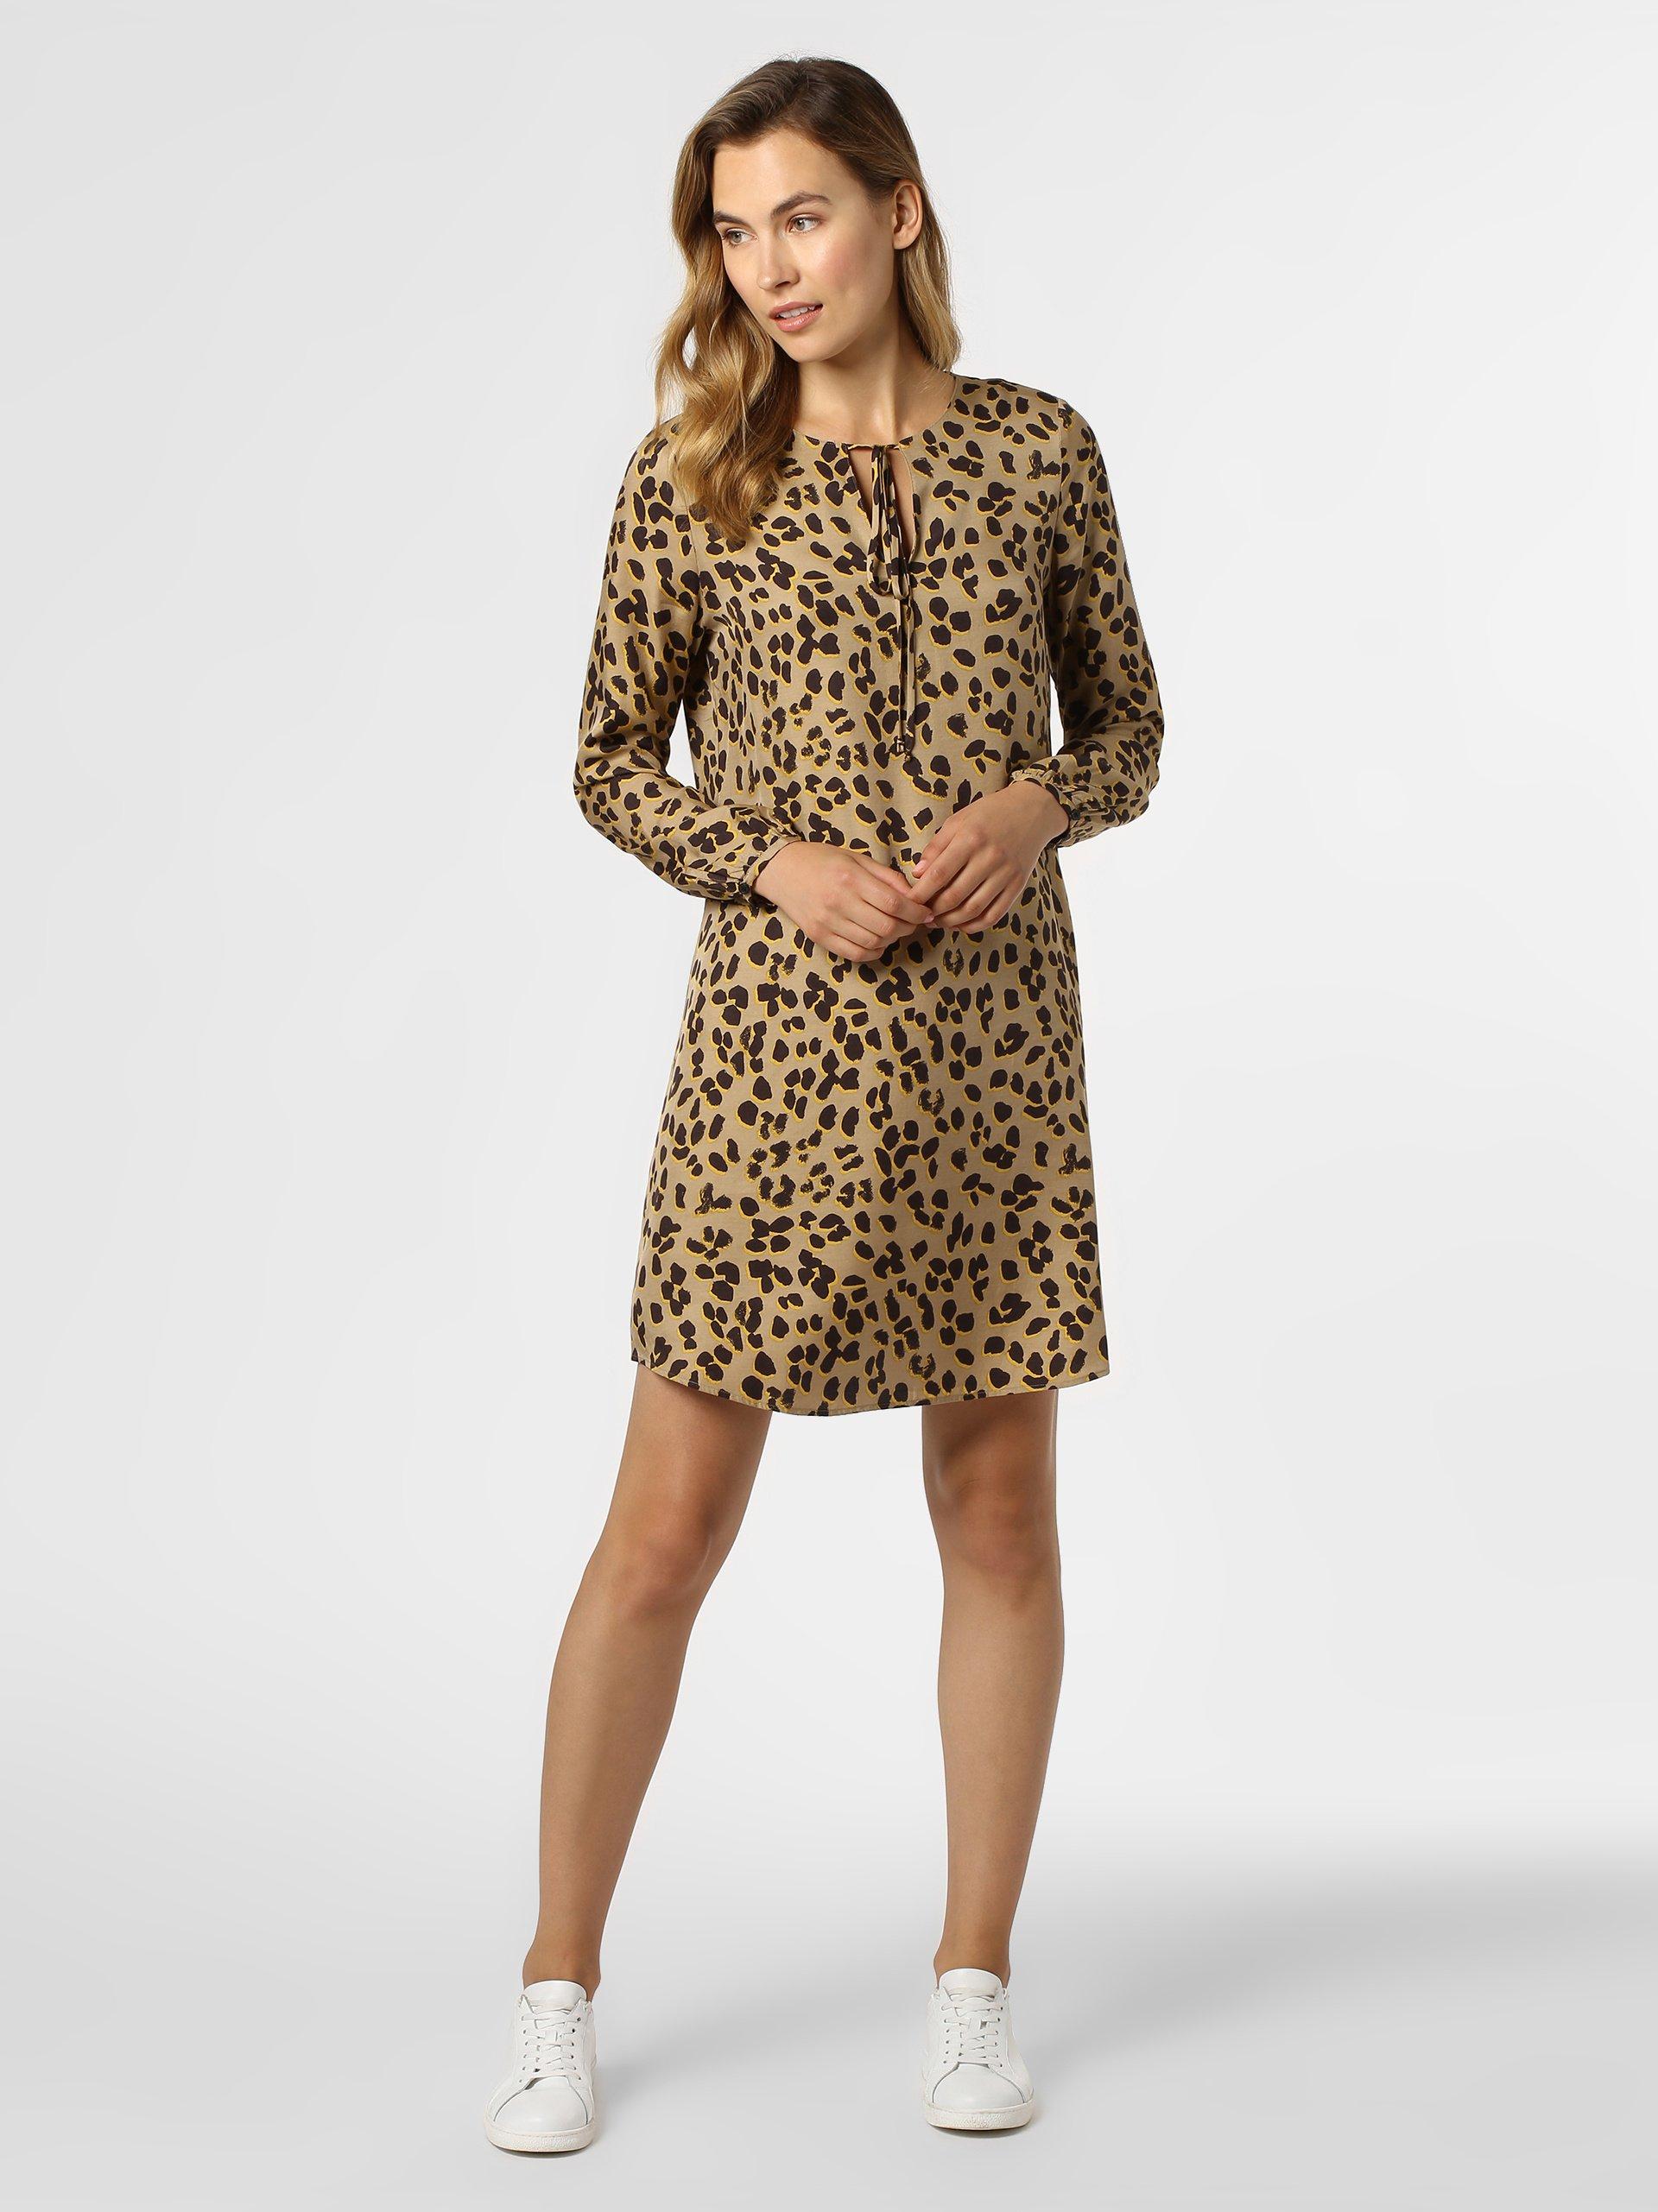 BOSS Casual Damen Kleid mit Seiden-Anteil - Effei_1